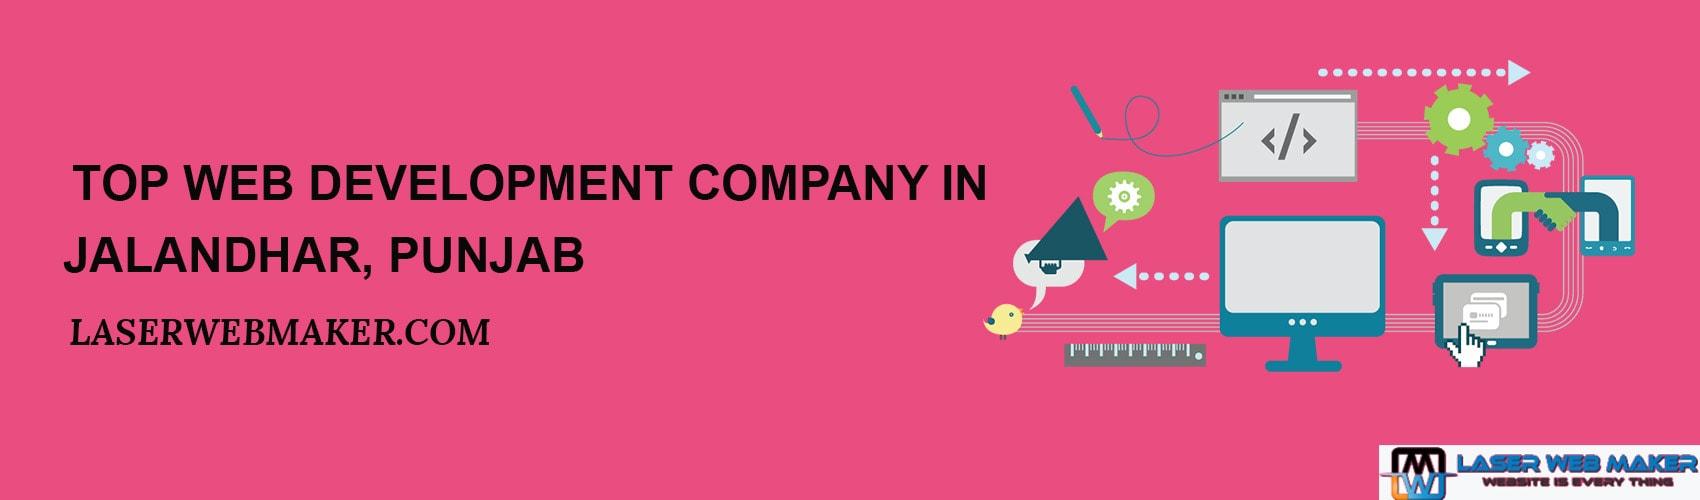 Top Web Development Company In Jalandhar